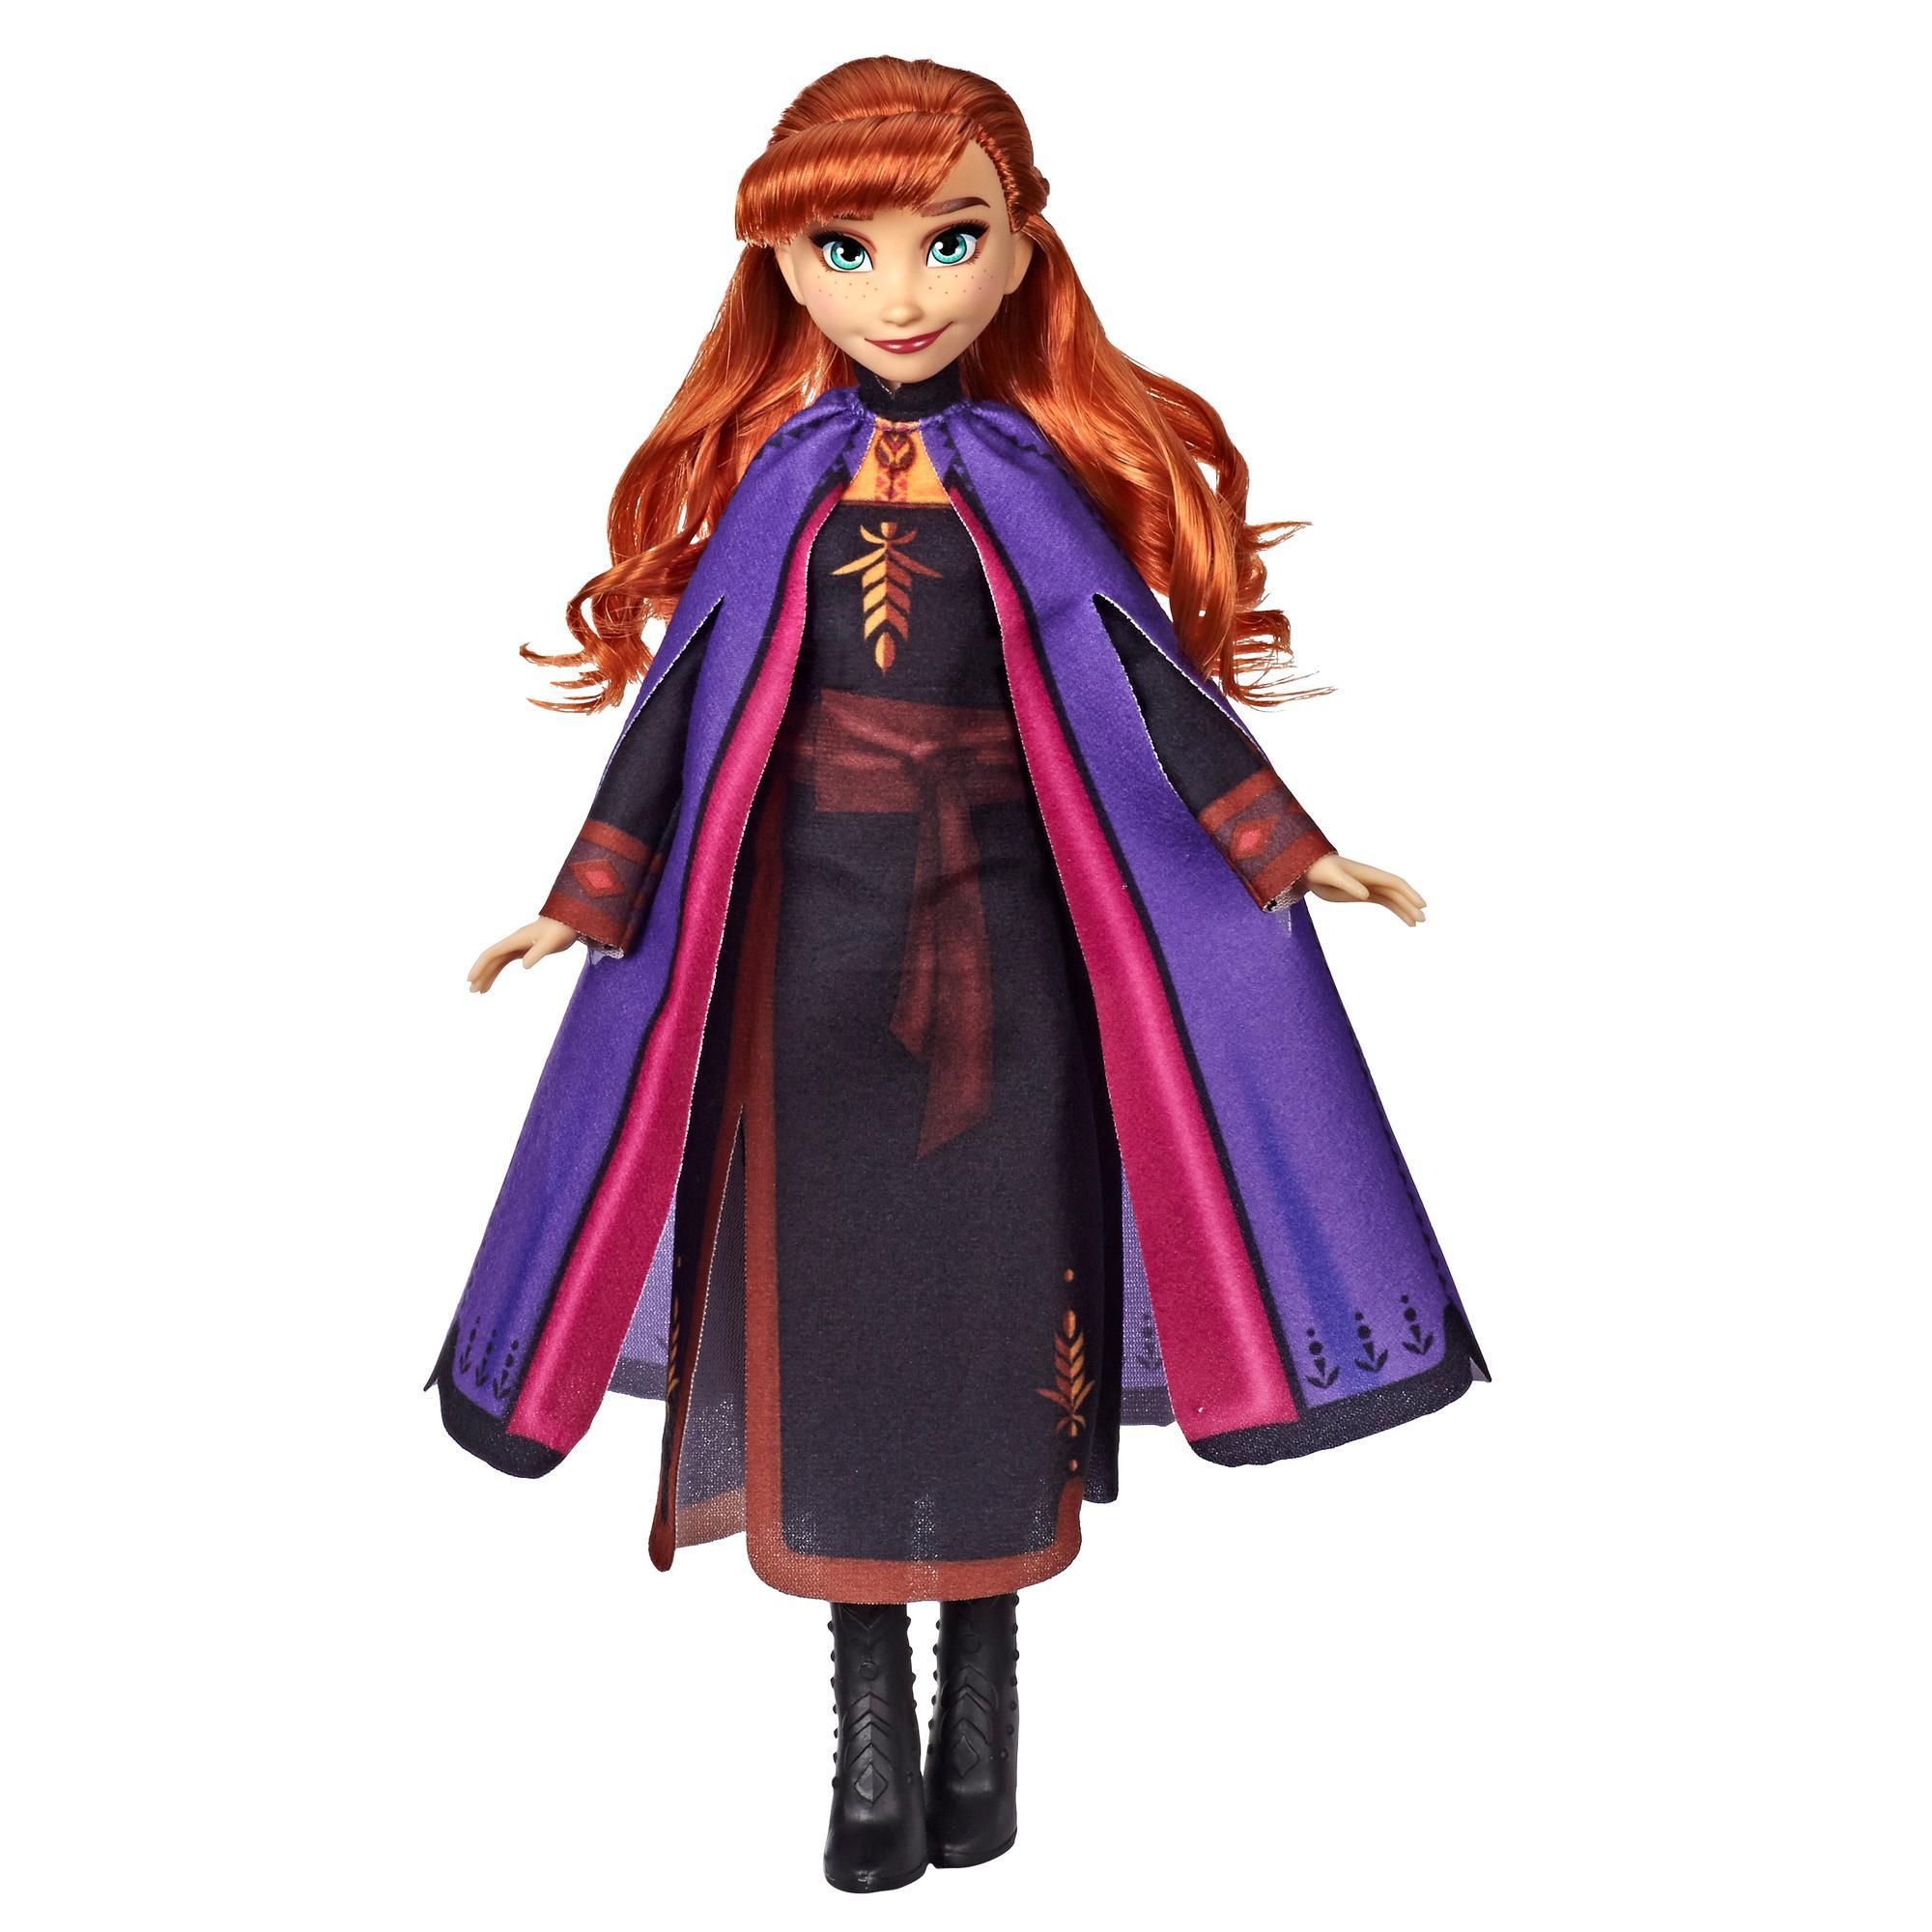 Disney Princess Frozen 2 Figure - Anna